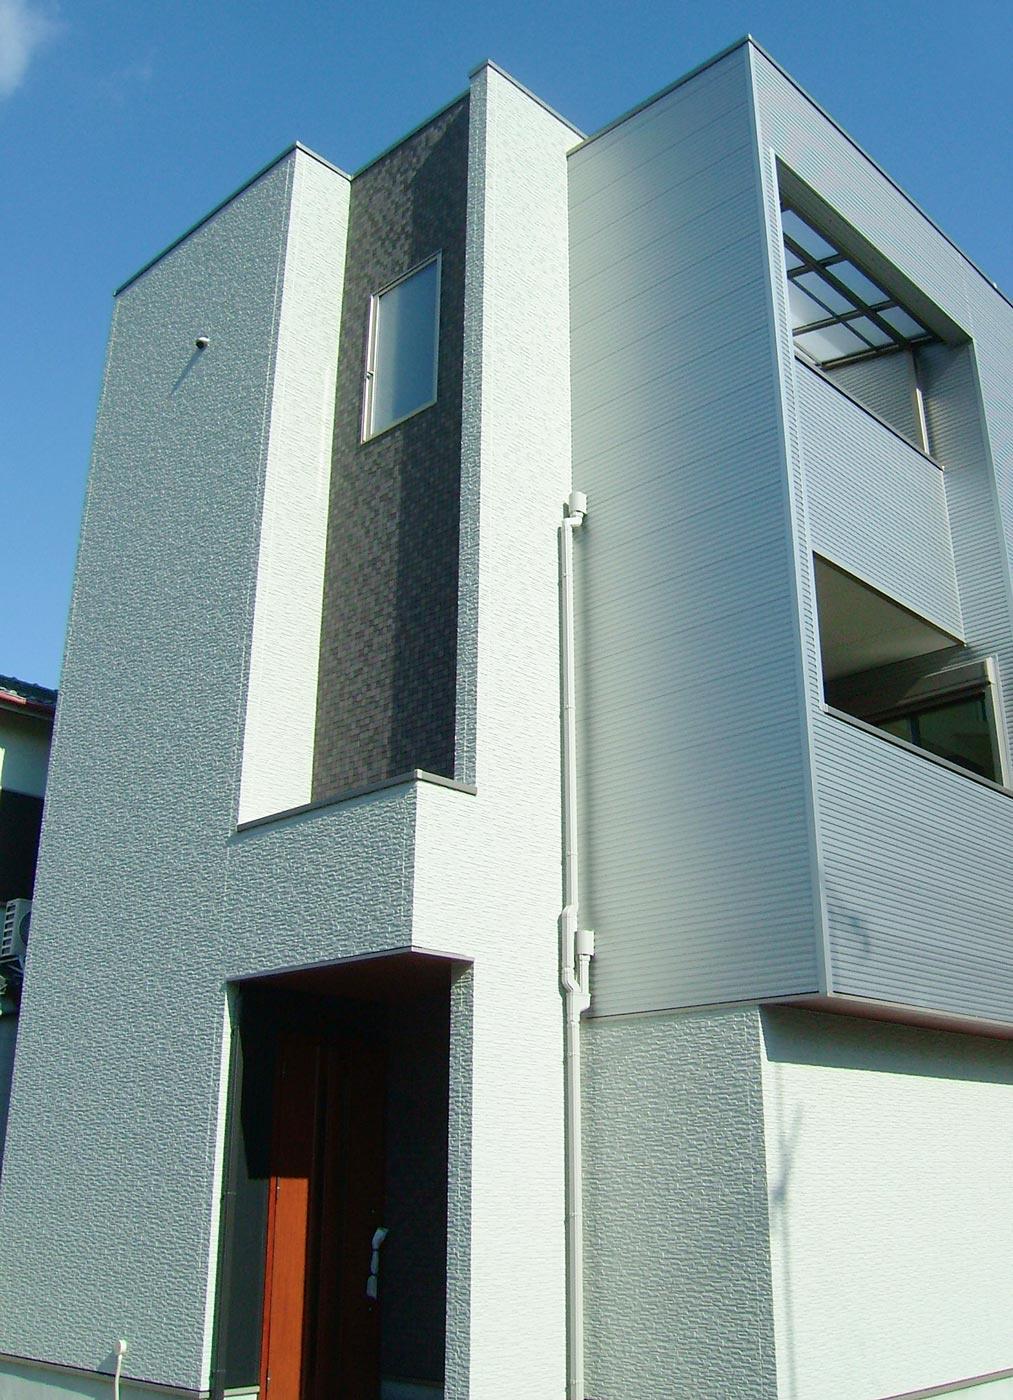 K様邸の外観画像。近代的なイメージが特徴。